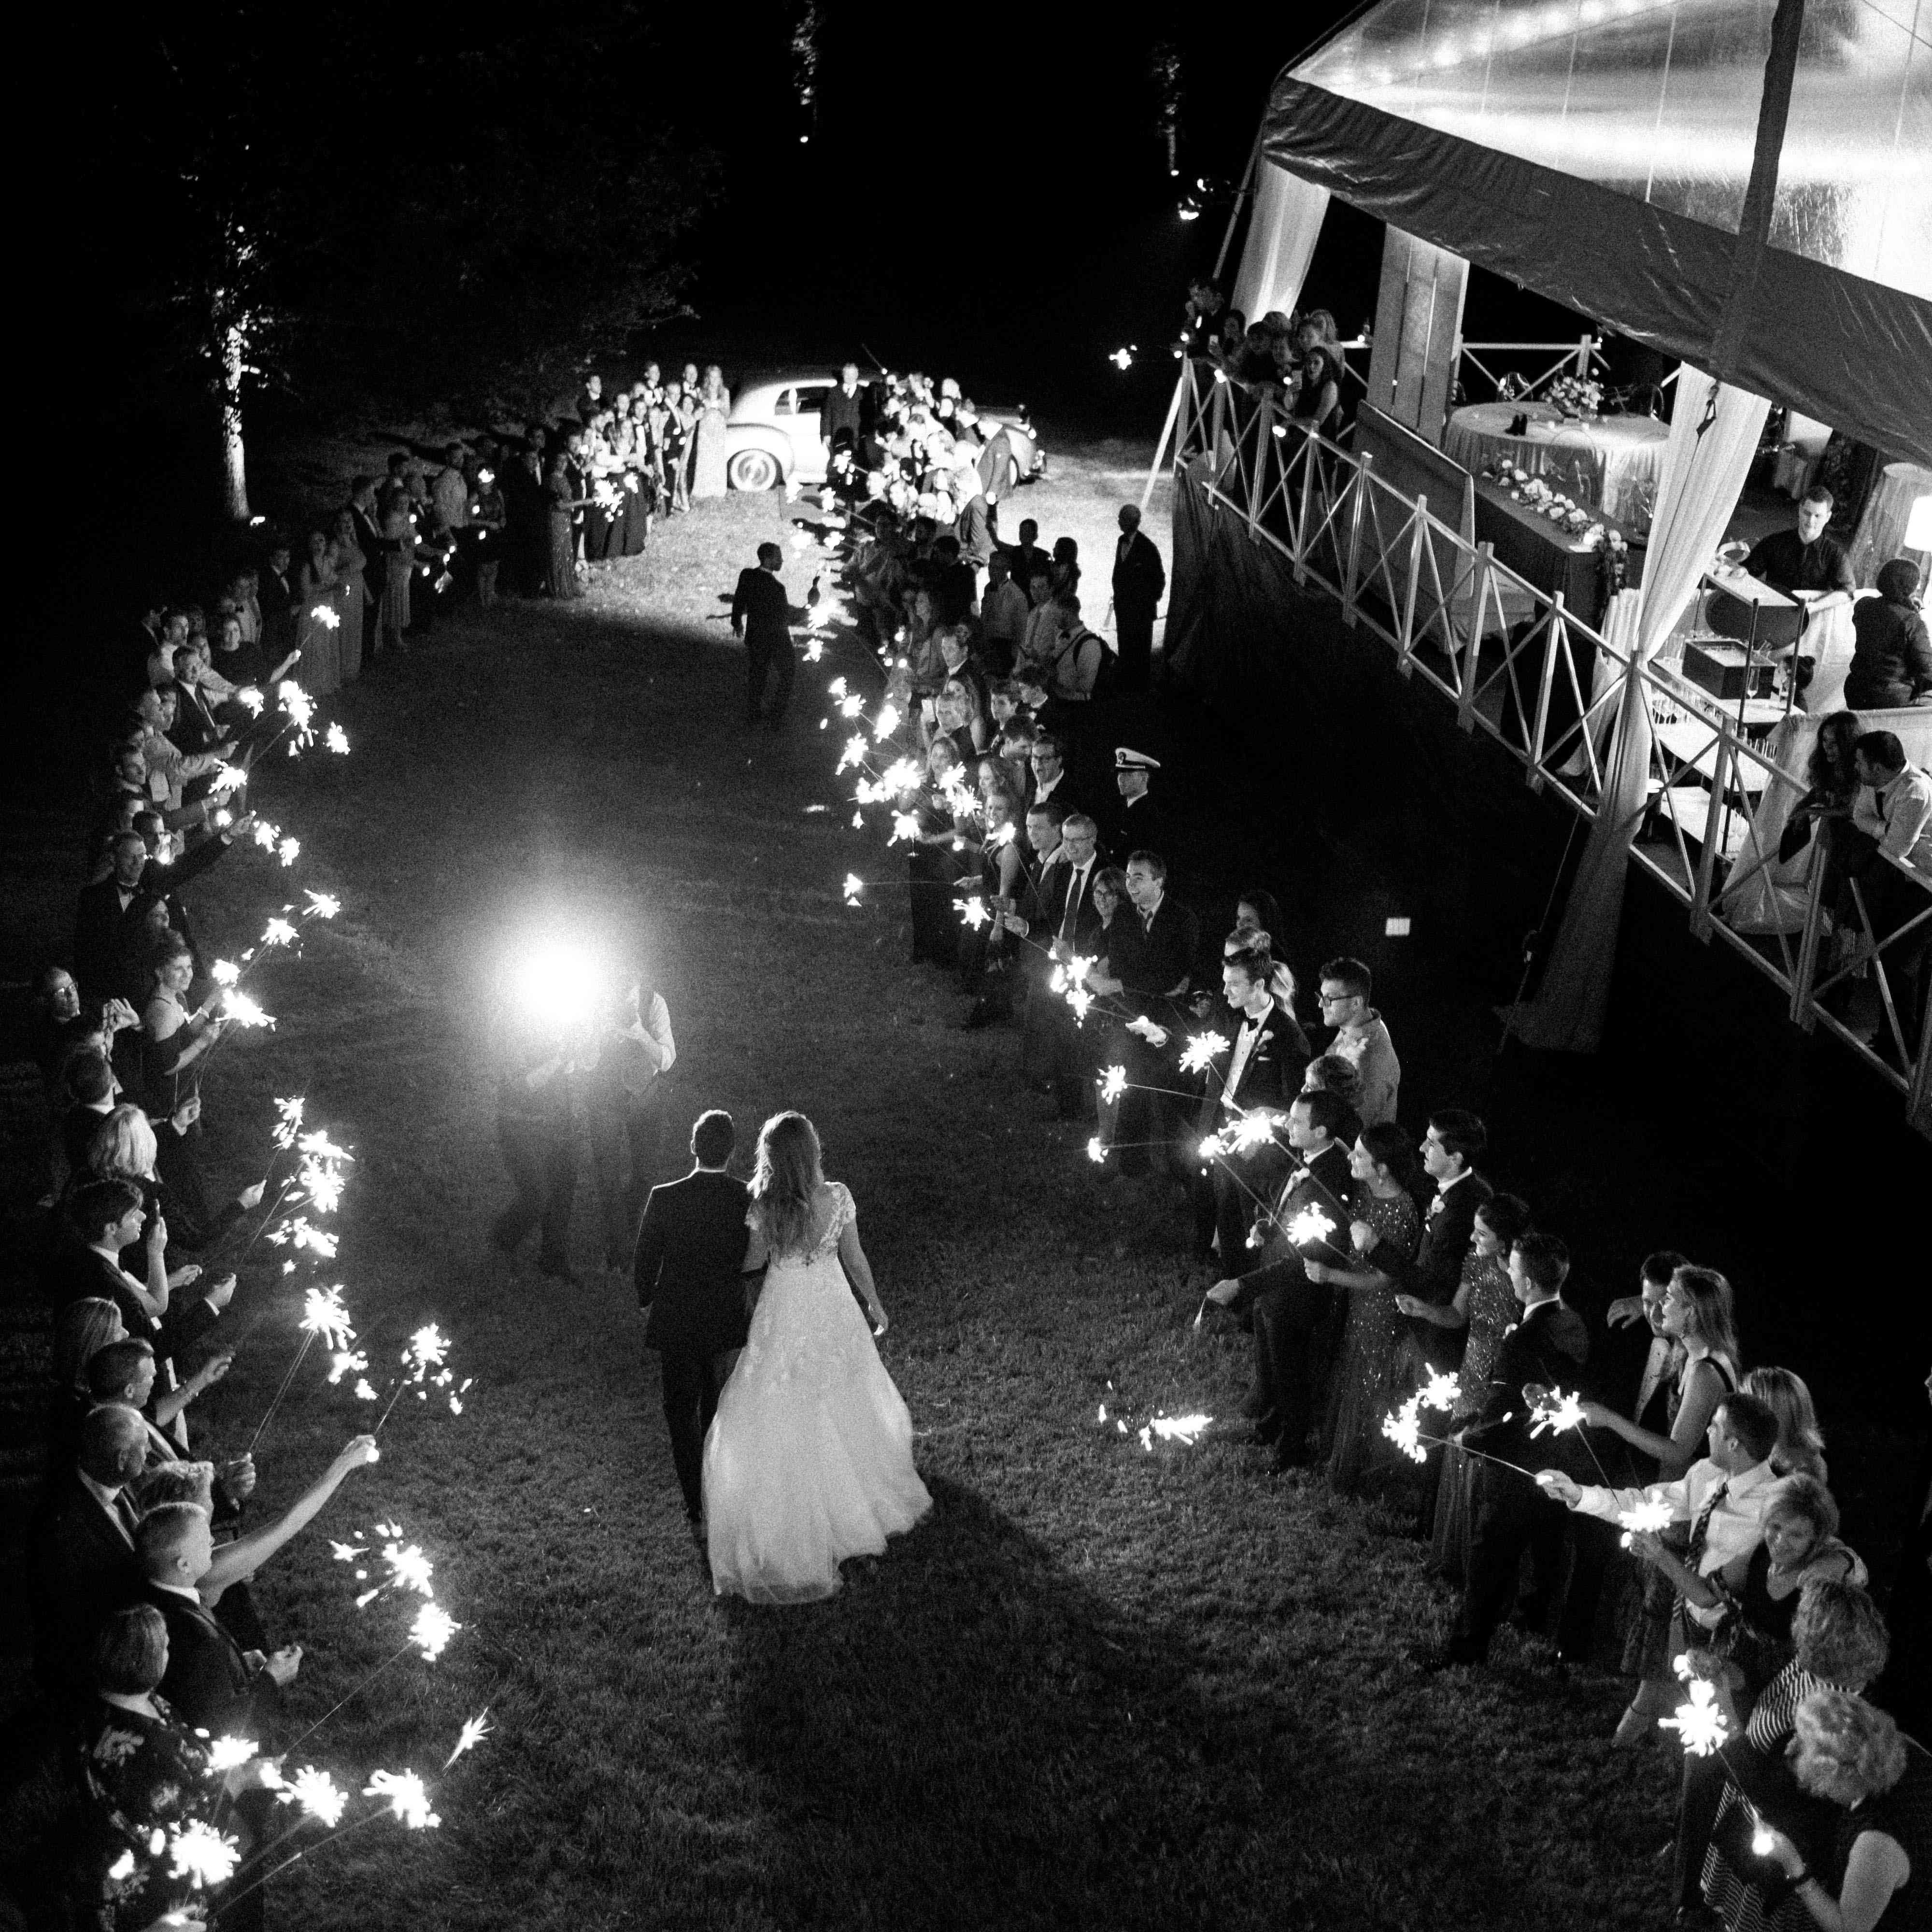 <p>Bride and groom reception sparklers</p><br><br>